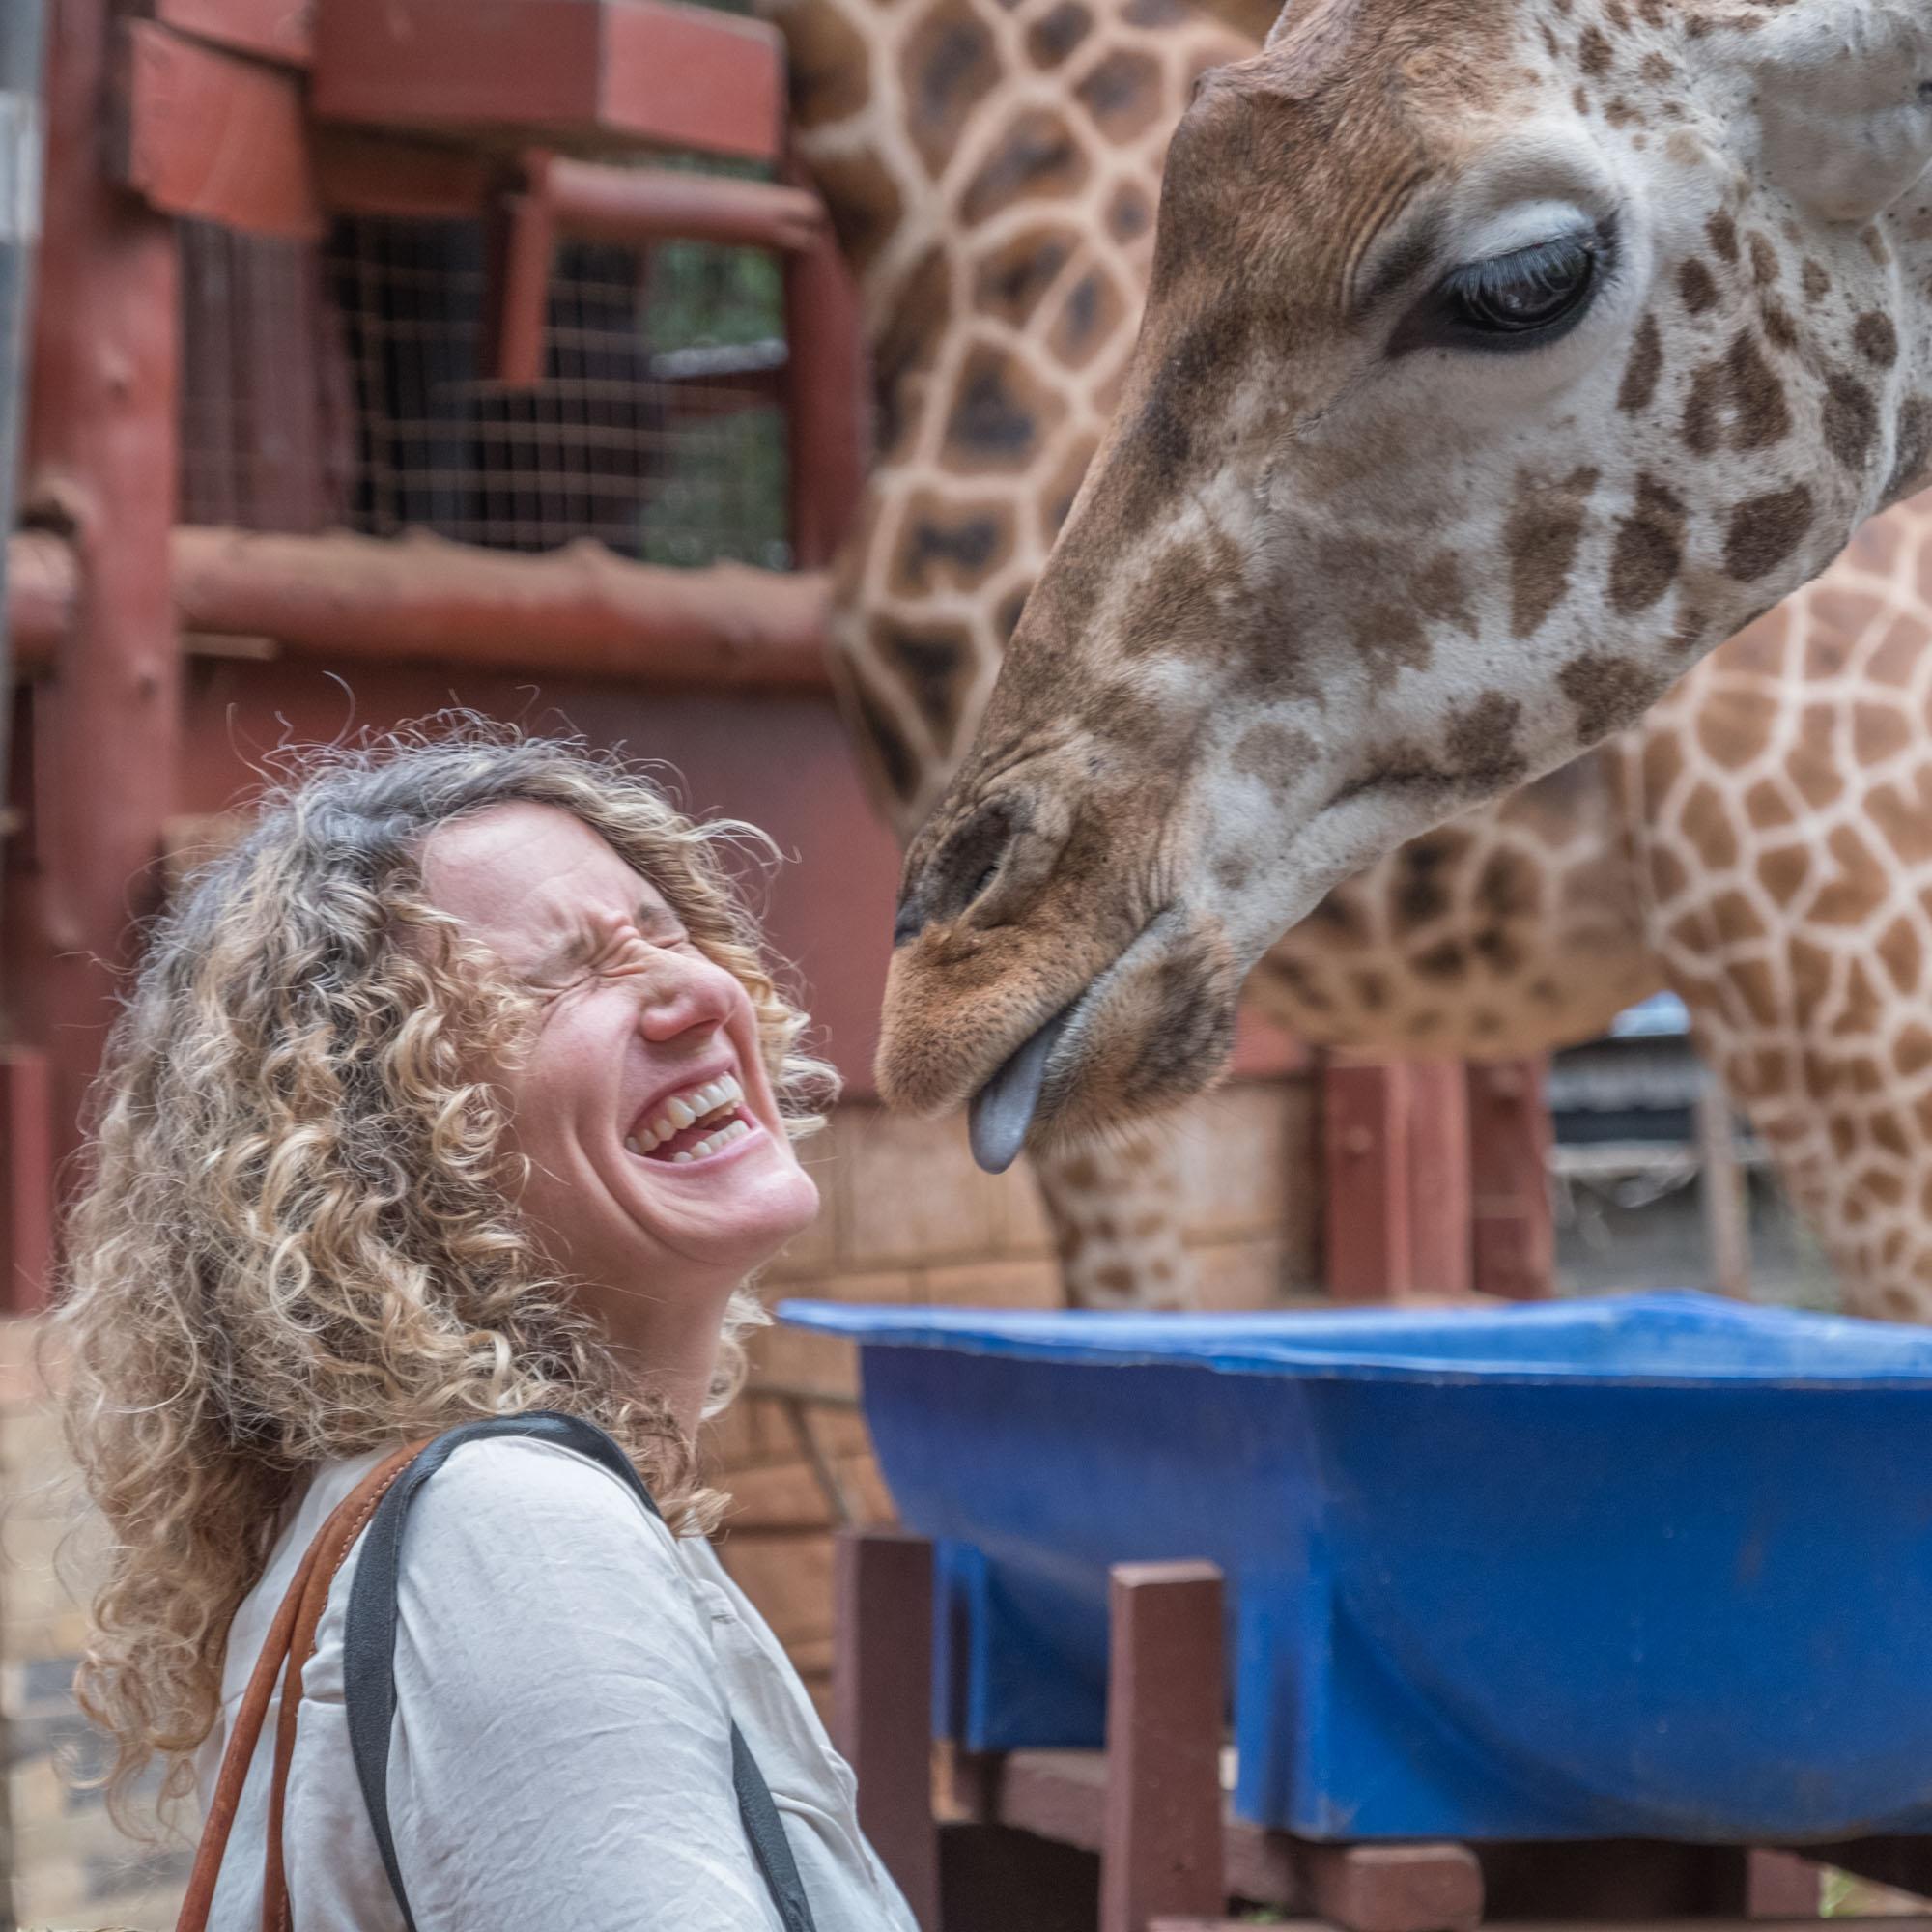 lorna-giraffe-kiss-nairobi-kenya-2018-01-11.jpg